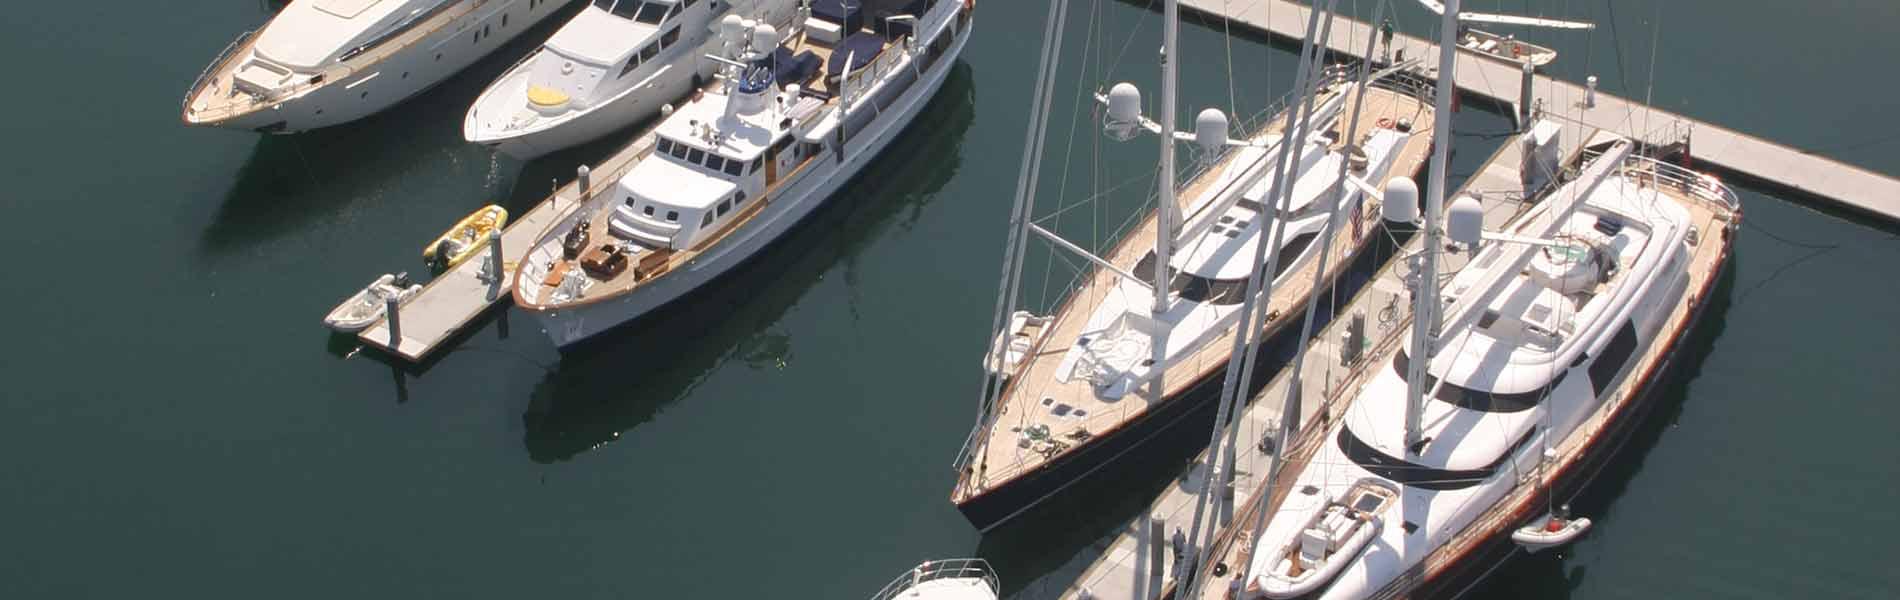 Yachts at Kona Kai Marina San Diego